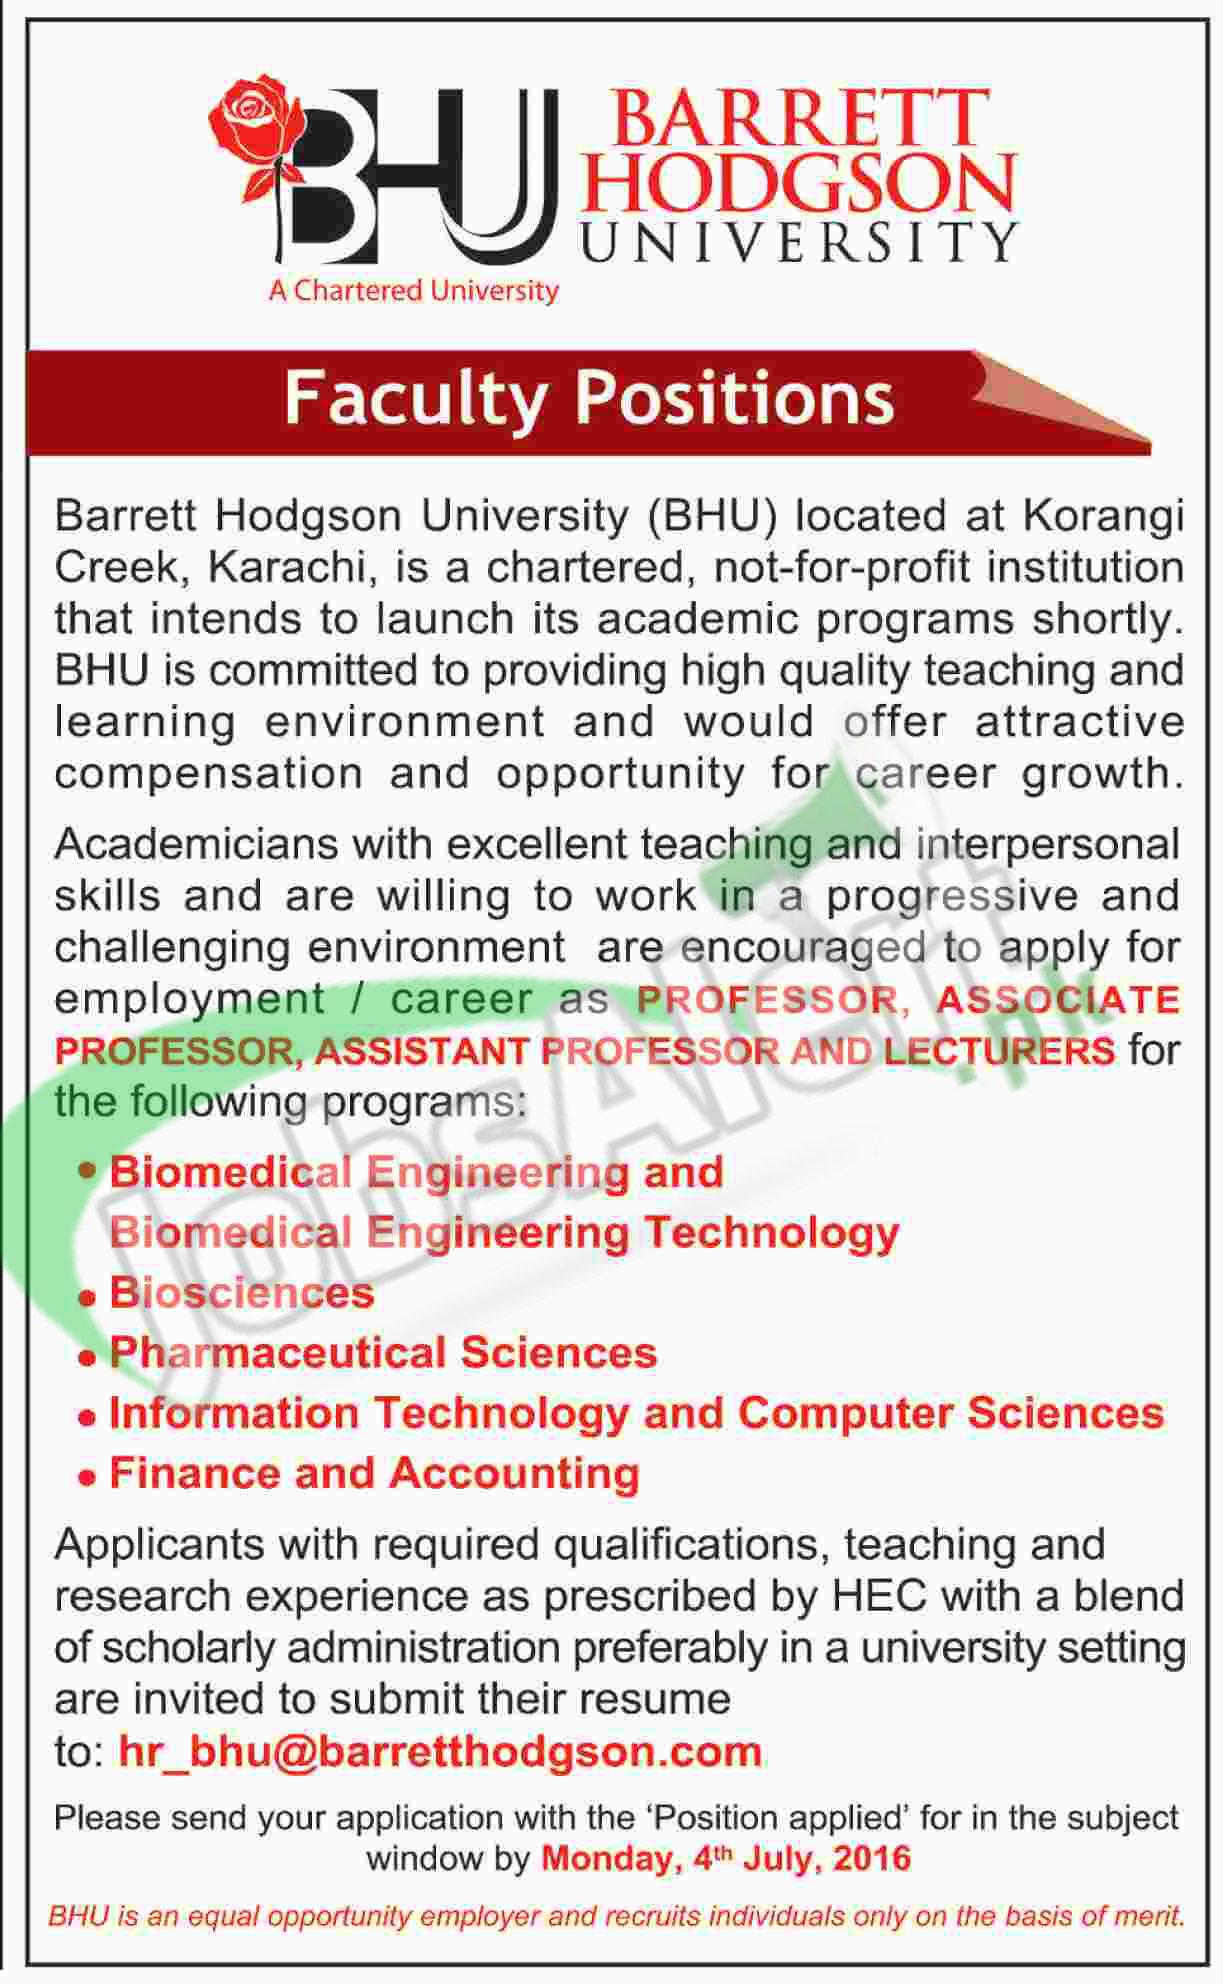 Barrett Hodgson University